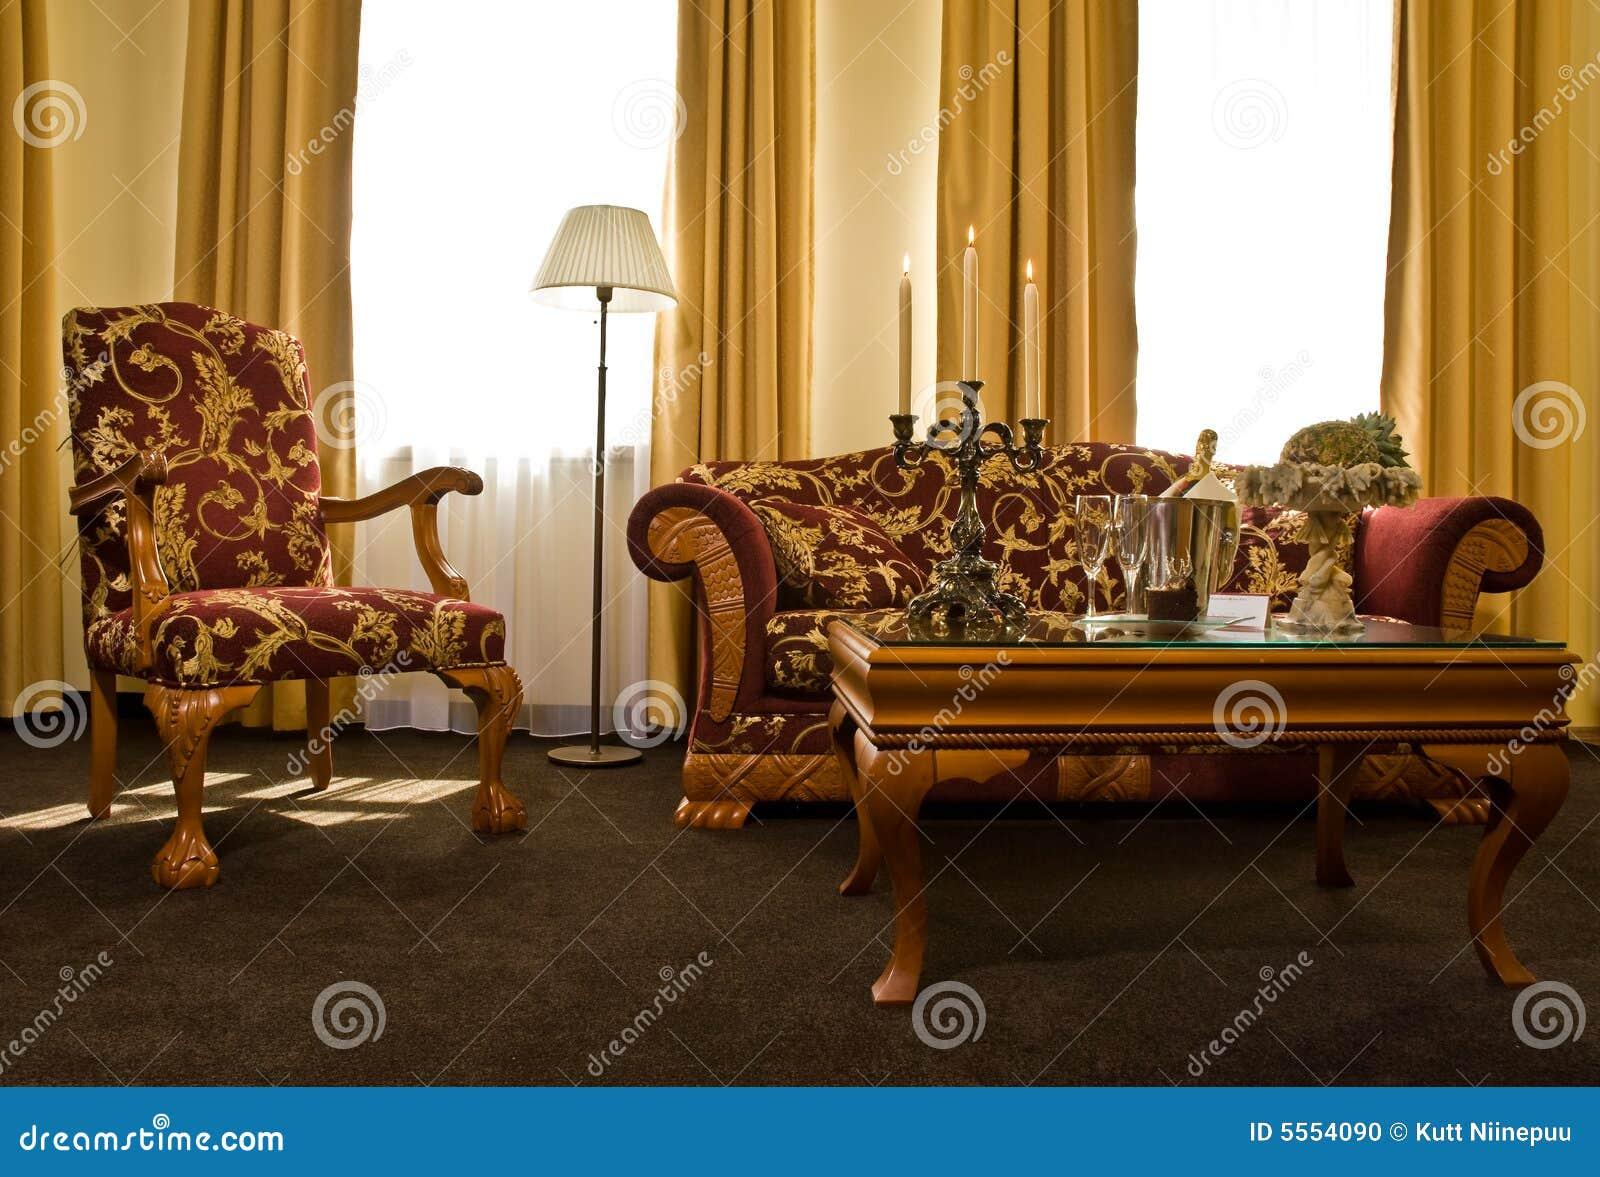 Matching antique furniture Stock Photo. Furniture Stock Photos  Images    Pictures   322 676 Images